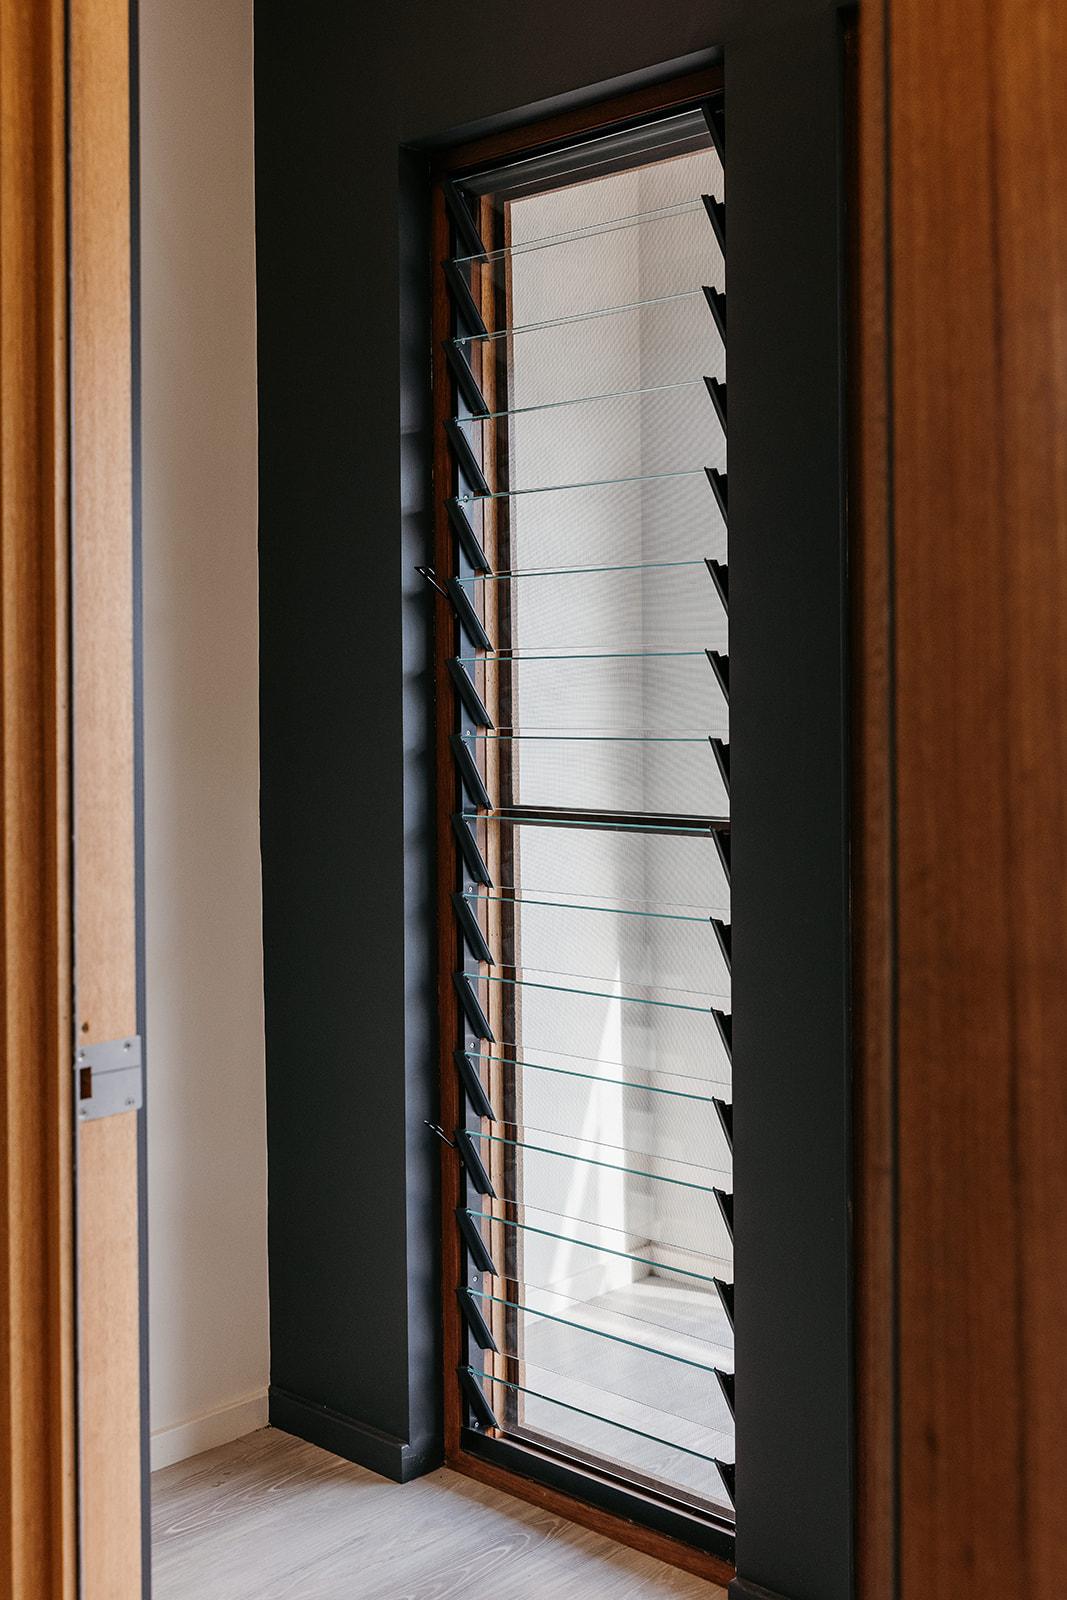 Natura timber louvre window and hardware